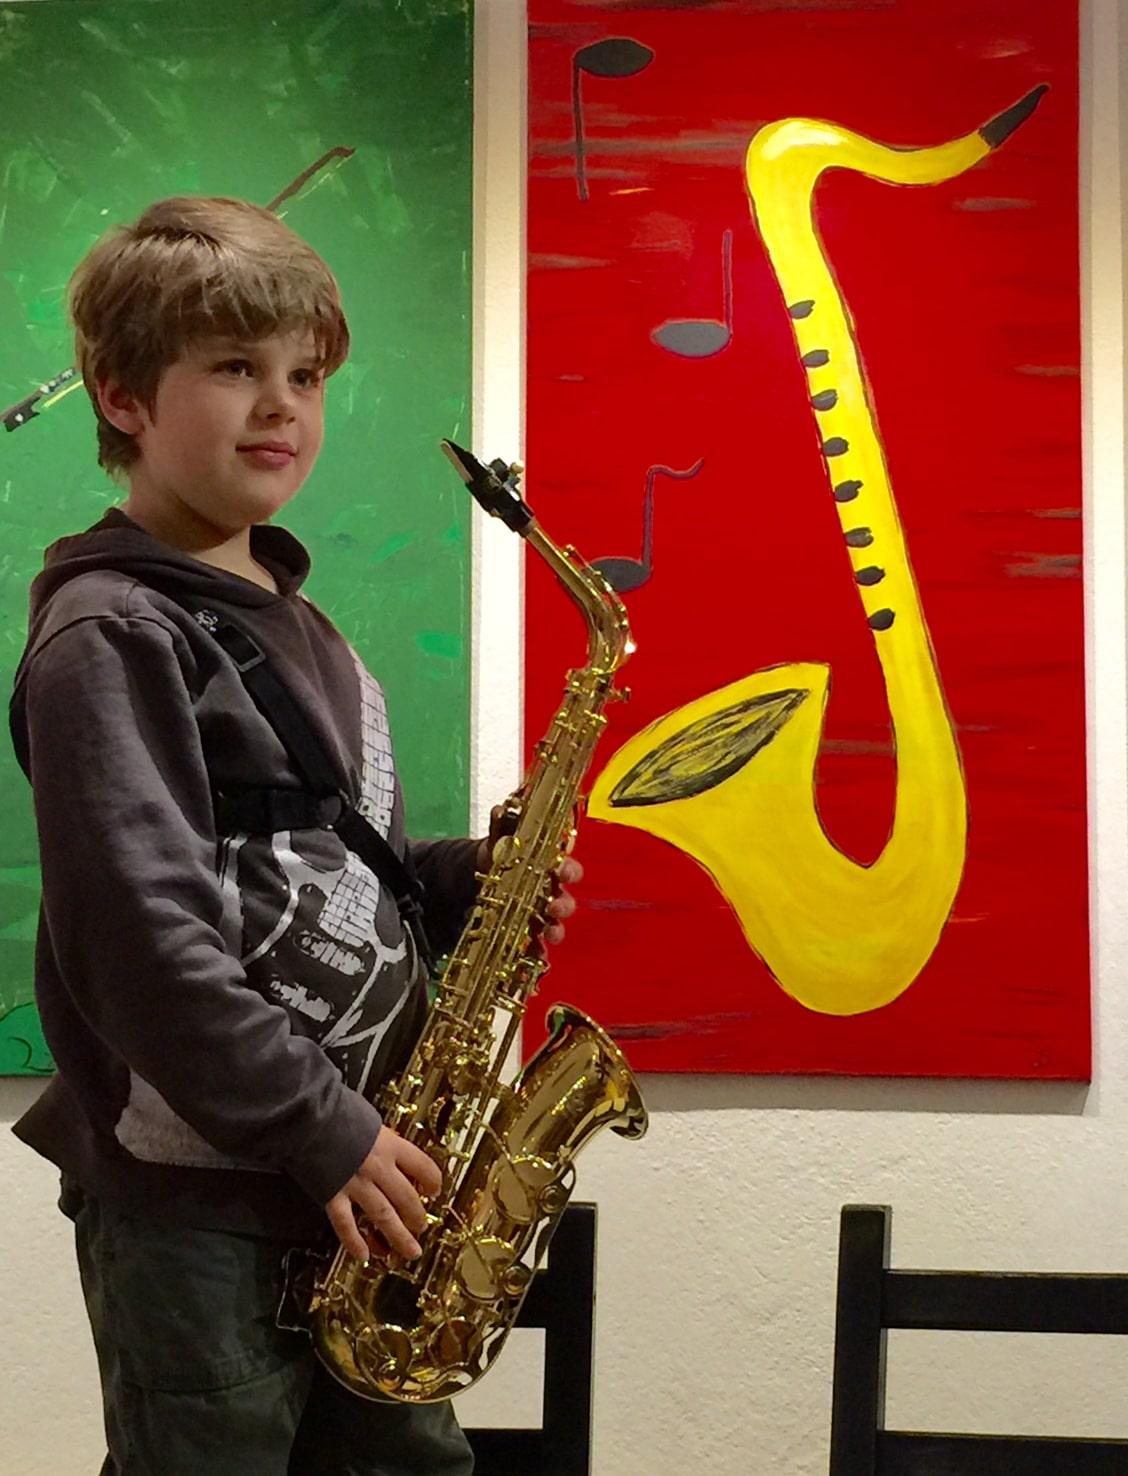 Junge mit Saxophon, Saxophonschüler MusiCeum